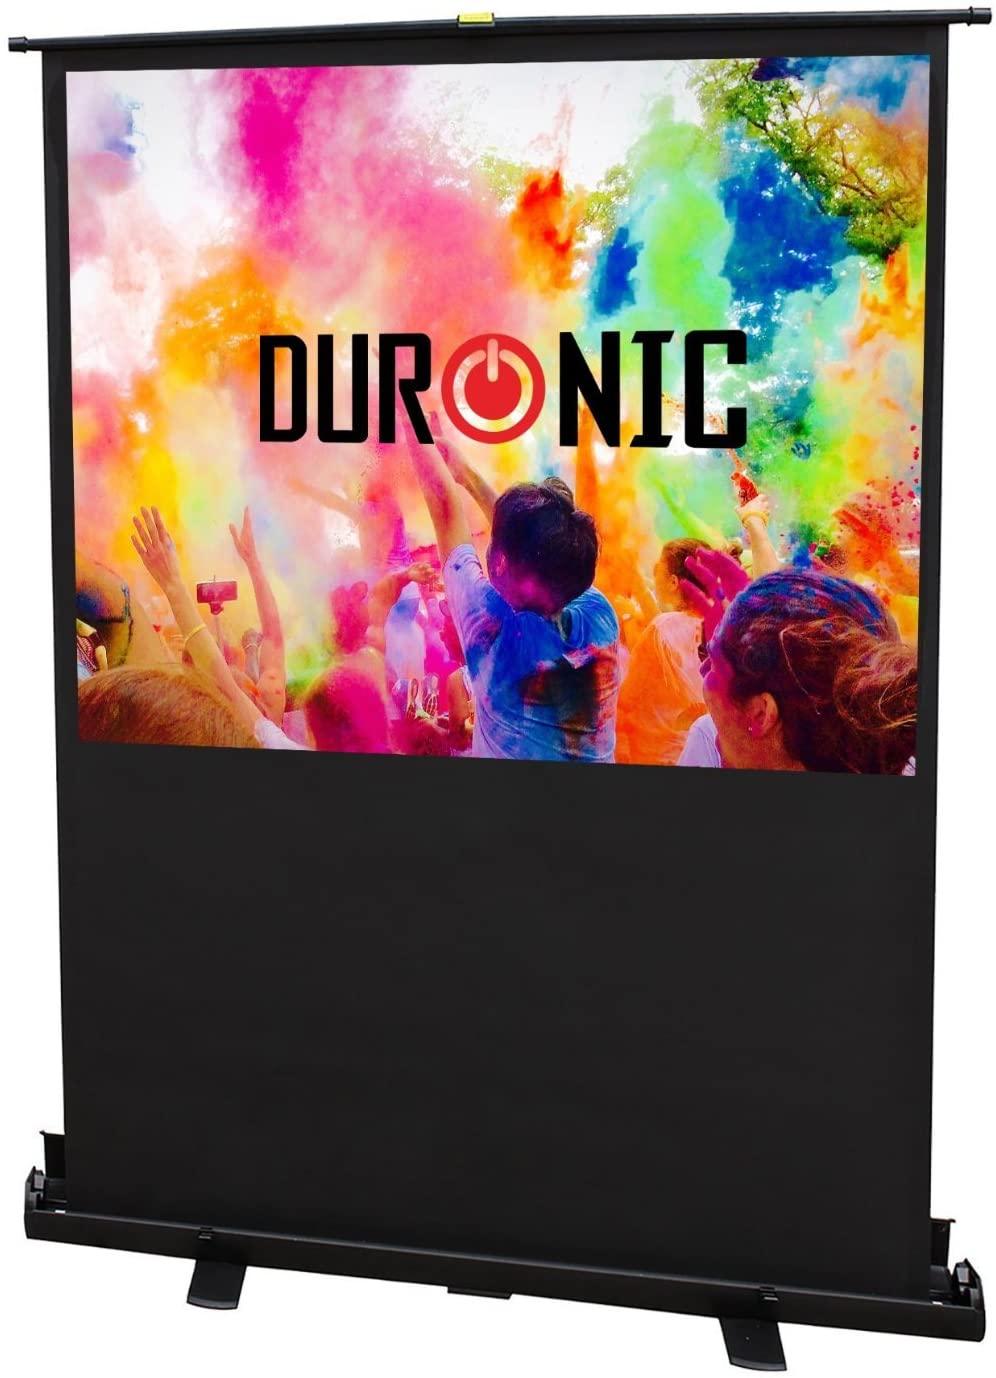 Duronic Projector Screen FPS100-43 - 100 inch Floor Projection Screen School Theatre Cinema Home Projector Screen Portable Freestanding uk reviews